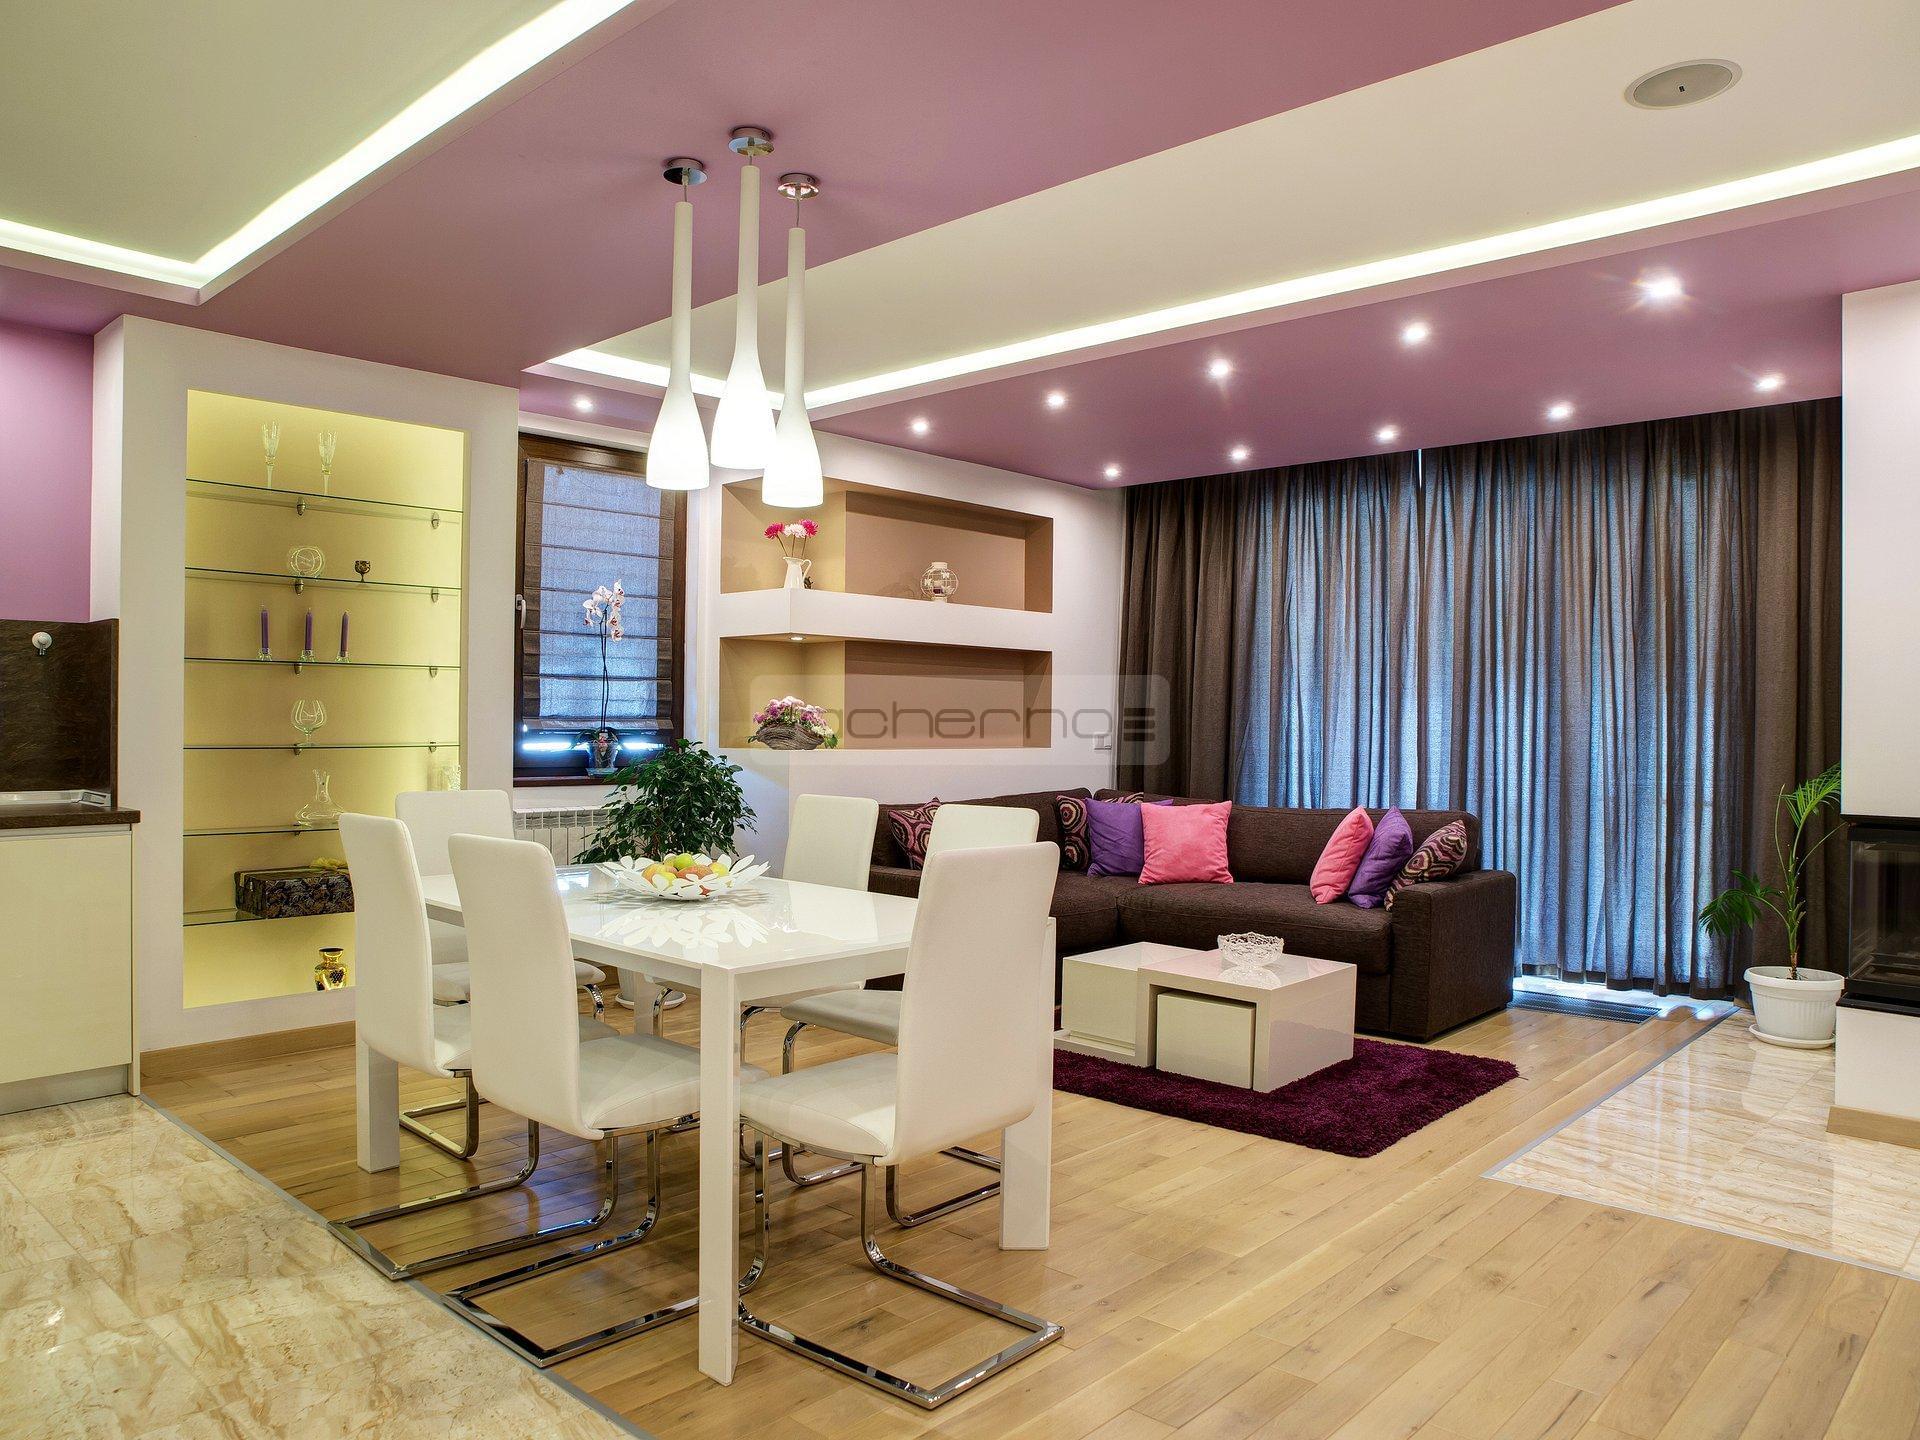 Acherno raumgestaltung stadtvilla liebe das leben for Raumgestaltung cafe